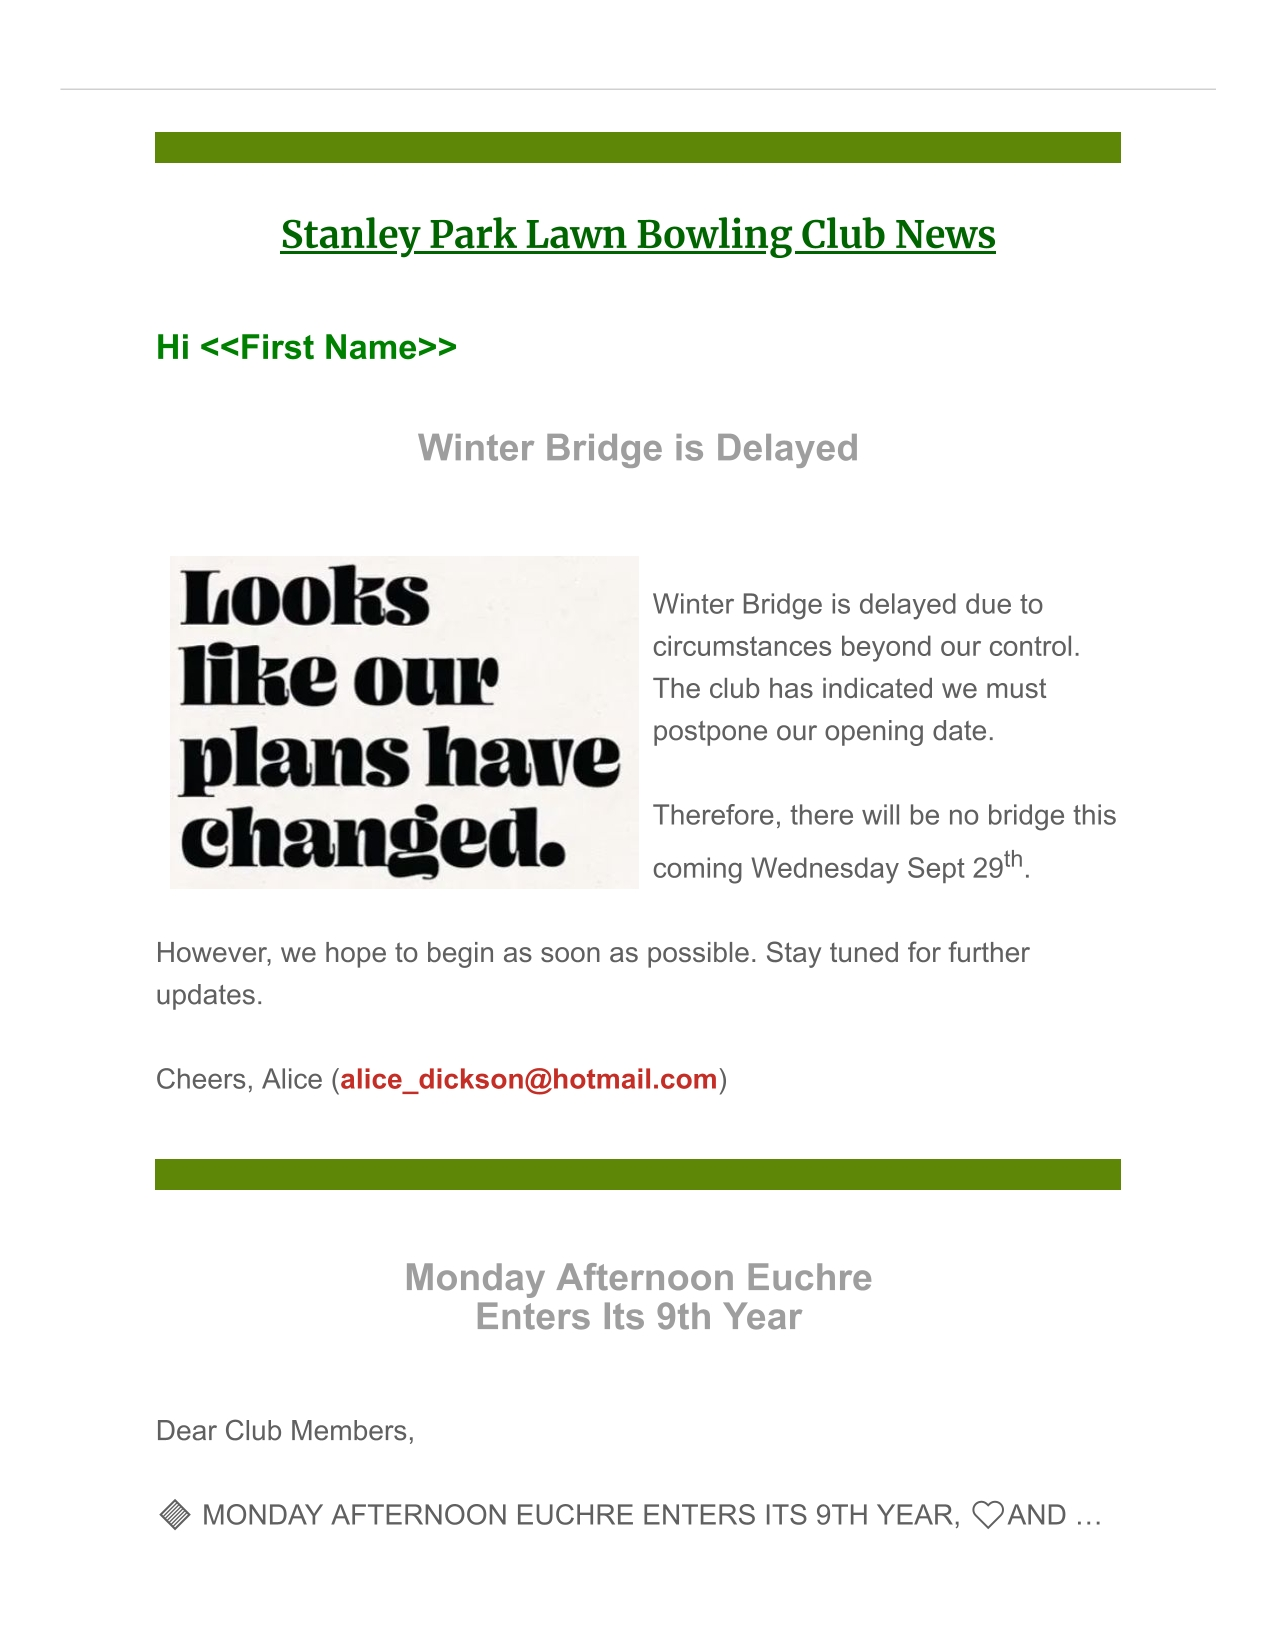 Stanley_Park_Lawn_Bowling_Club_News-1.jpg